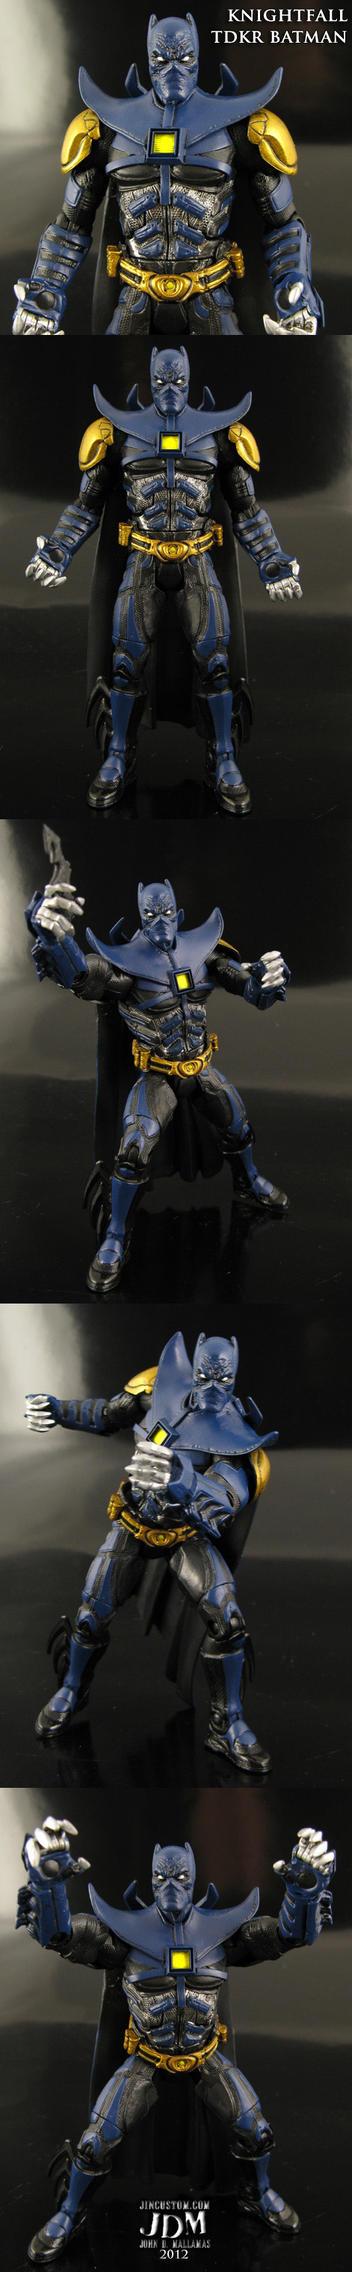 Knightfall Movie Masters Batman figure by Jin-Saotome